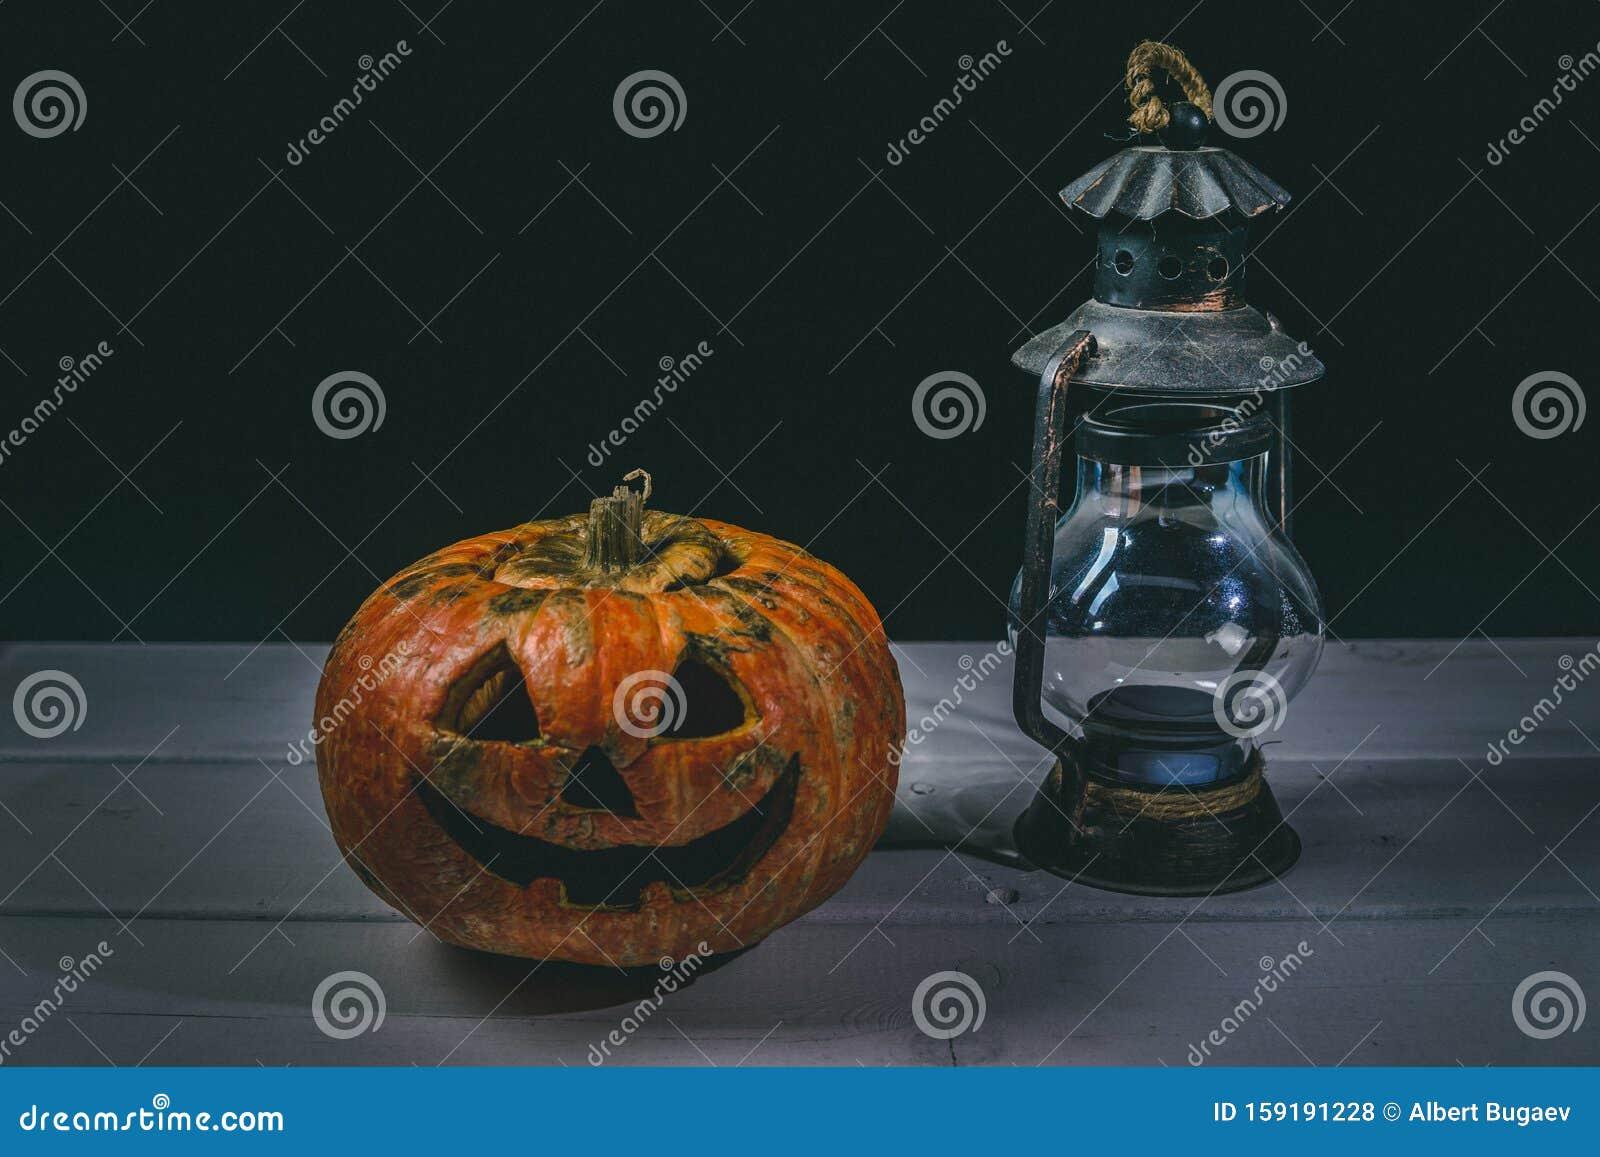 Halloween Pumpkin And Lamp  Happy Halloween Holiday